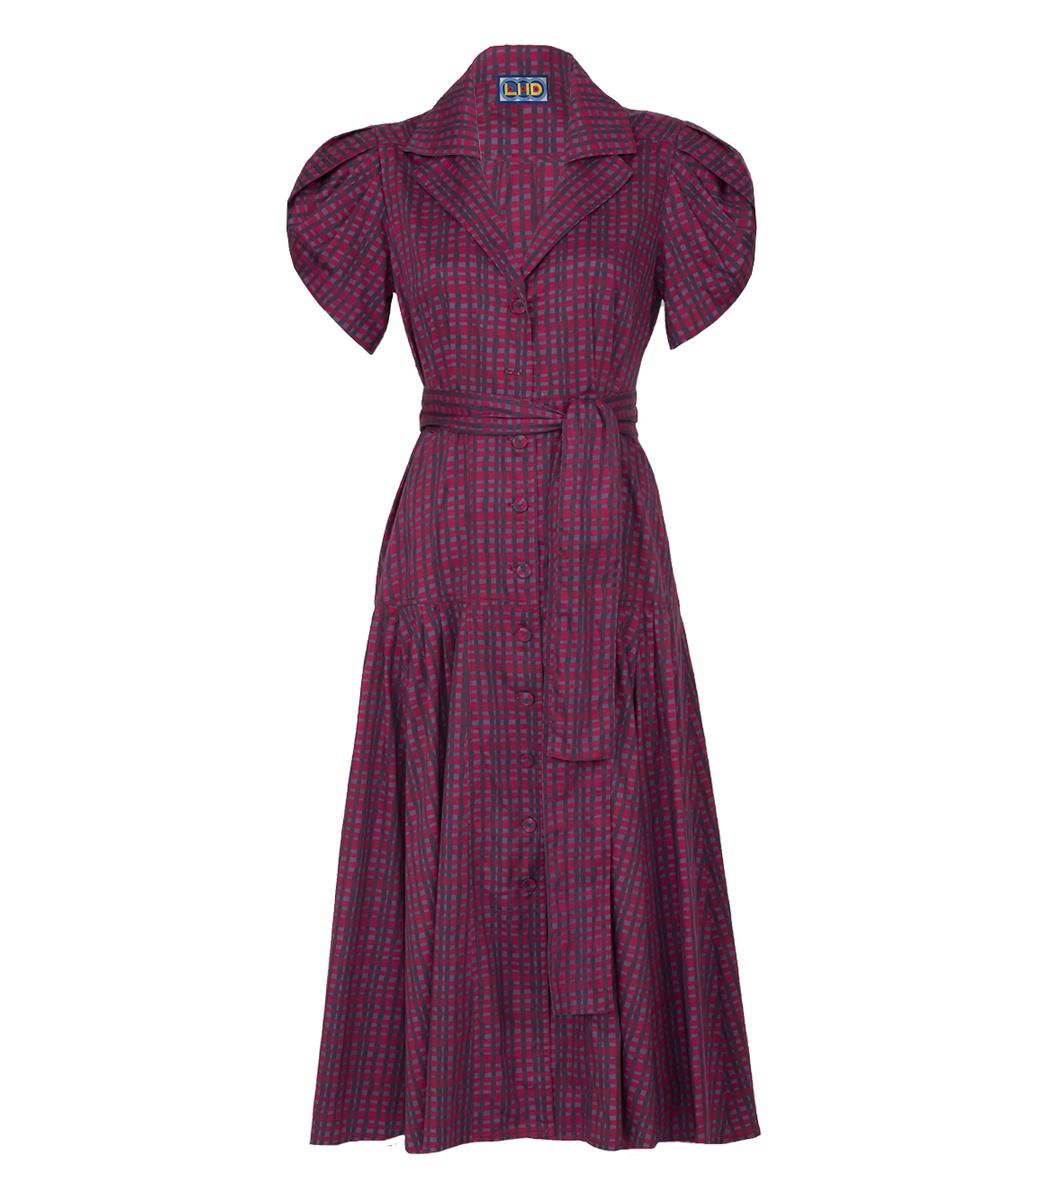 Lhd Red Glades Dress